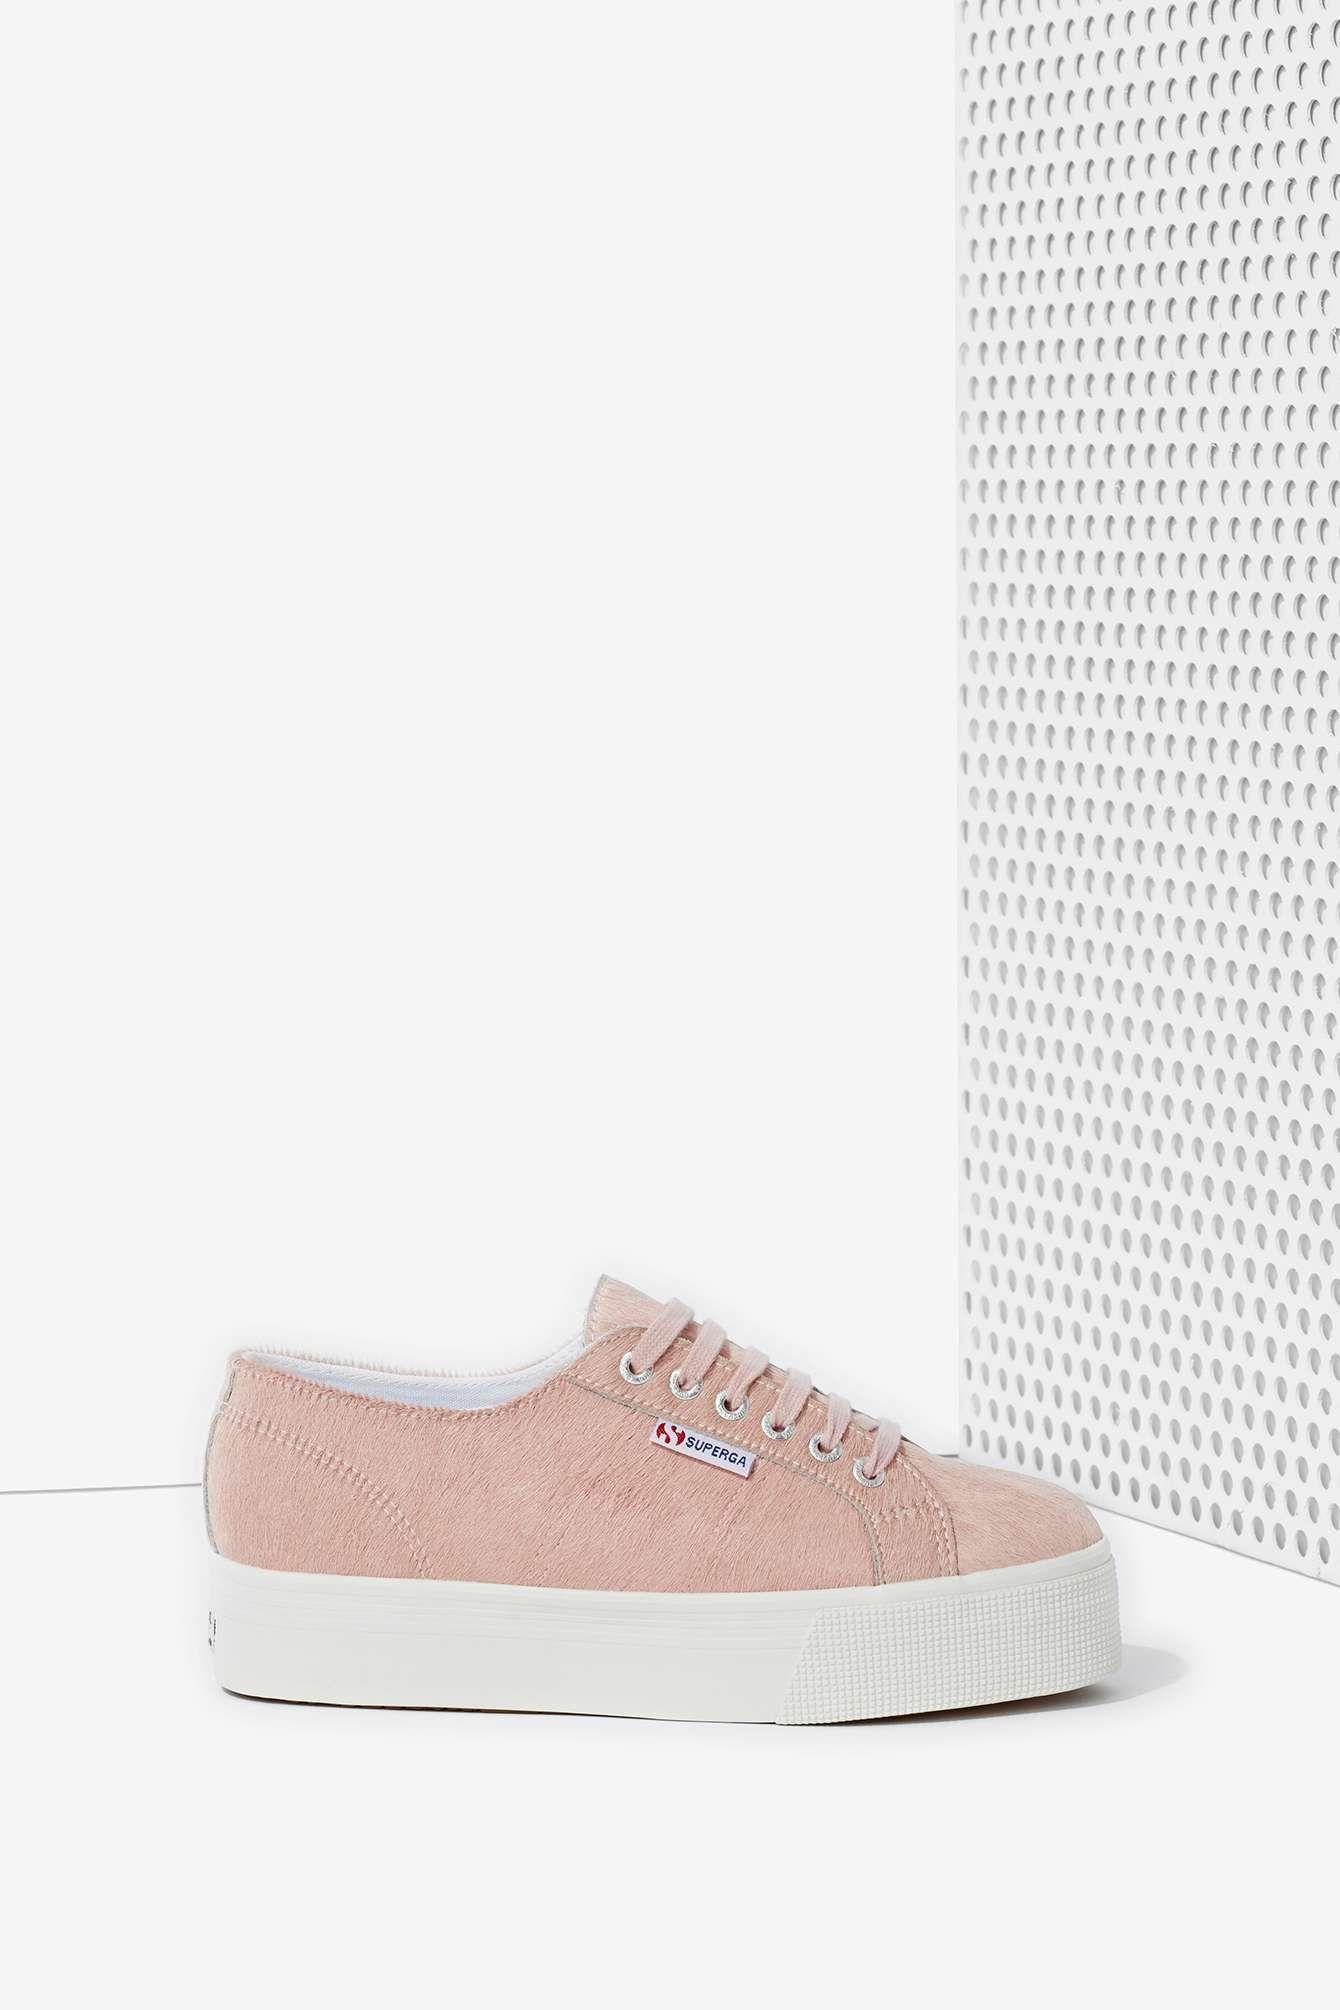 27eec9a6a962 Superga Pony Platform Sneaker   Shop Shoes at Nasty Gal Adidas Zx, Adidas  Gazelle,